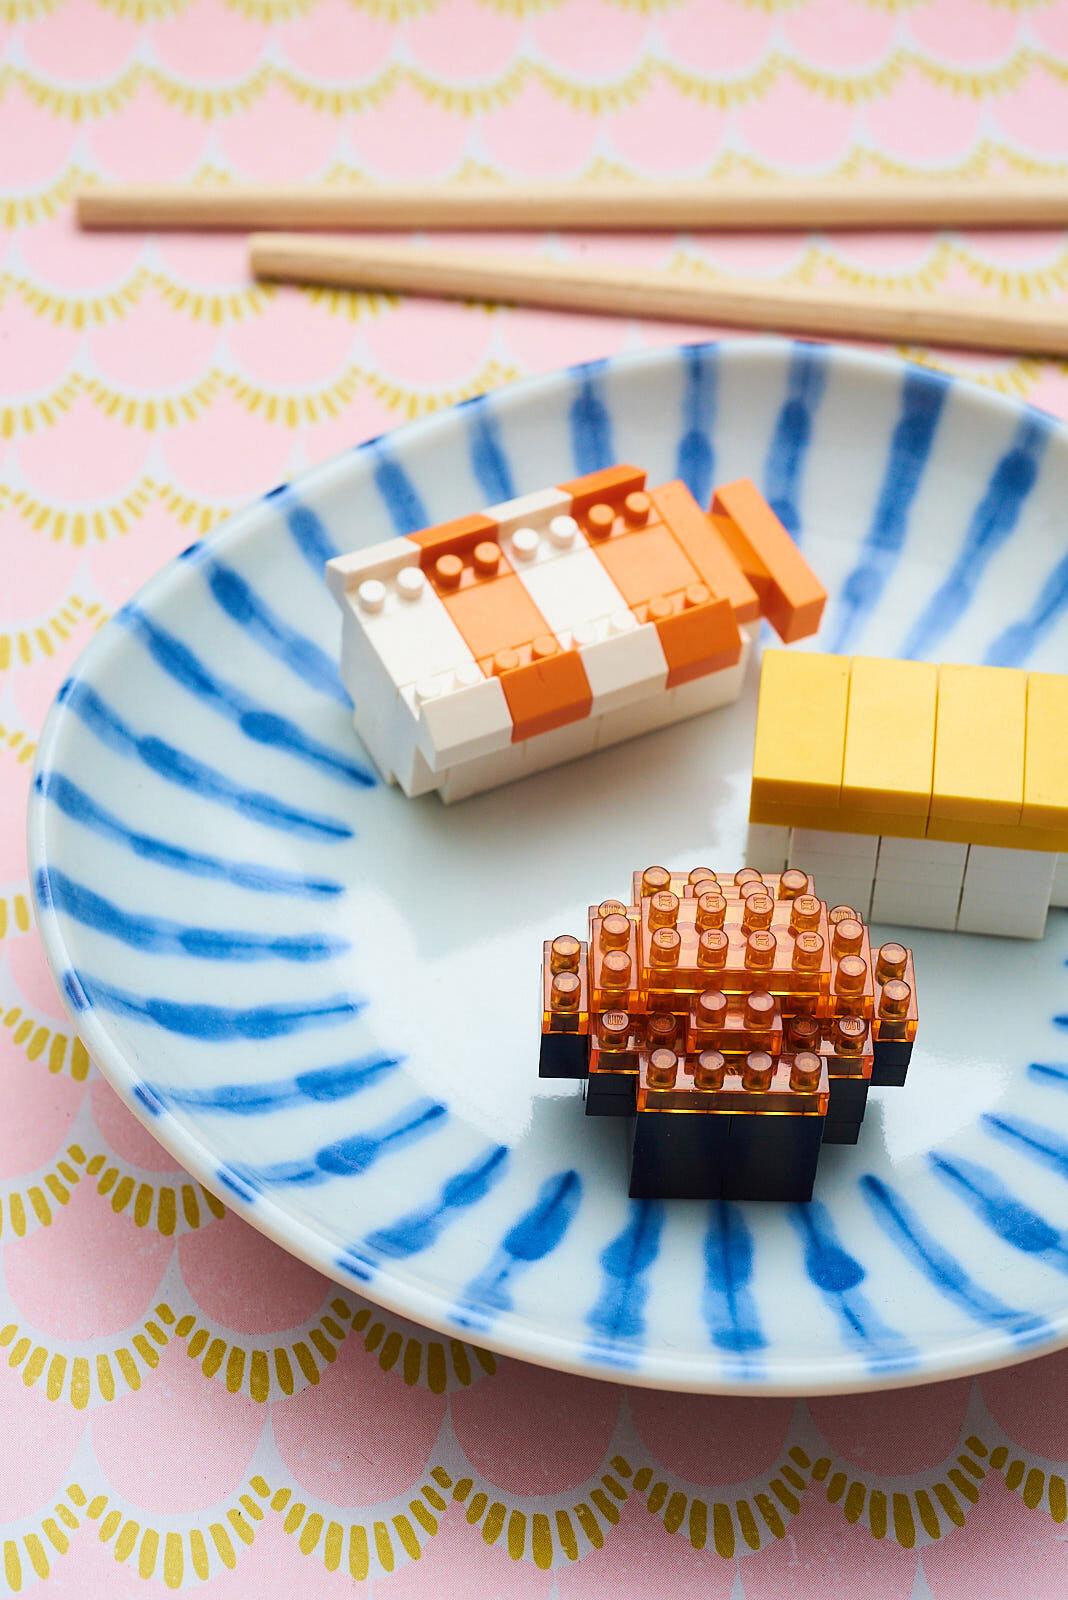 Lego_Sushi_Rebecca_Peloquin_Photography.jpg